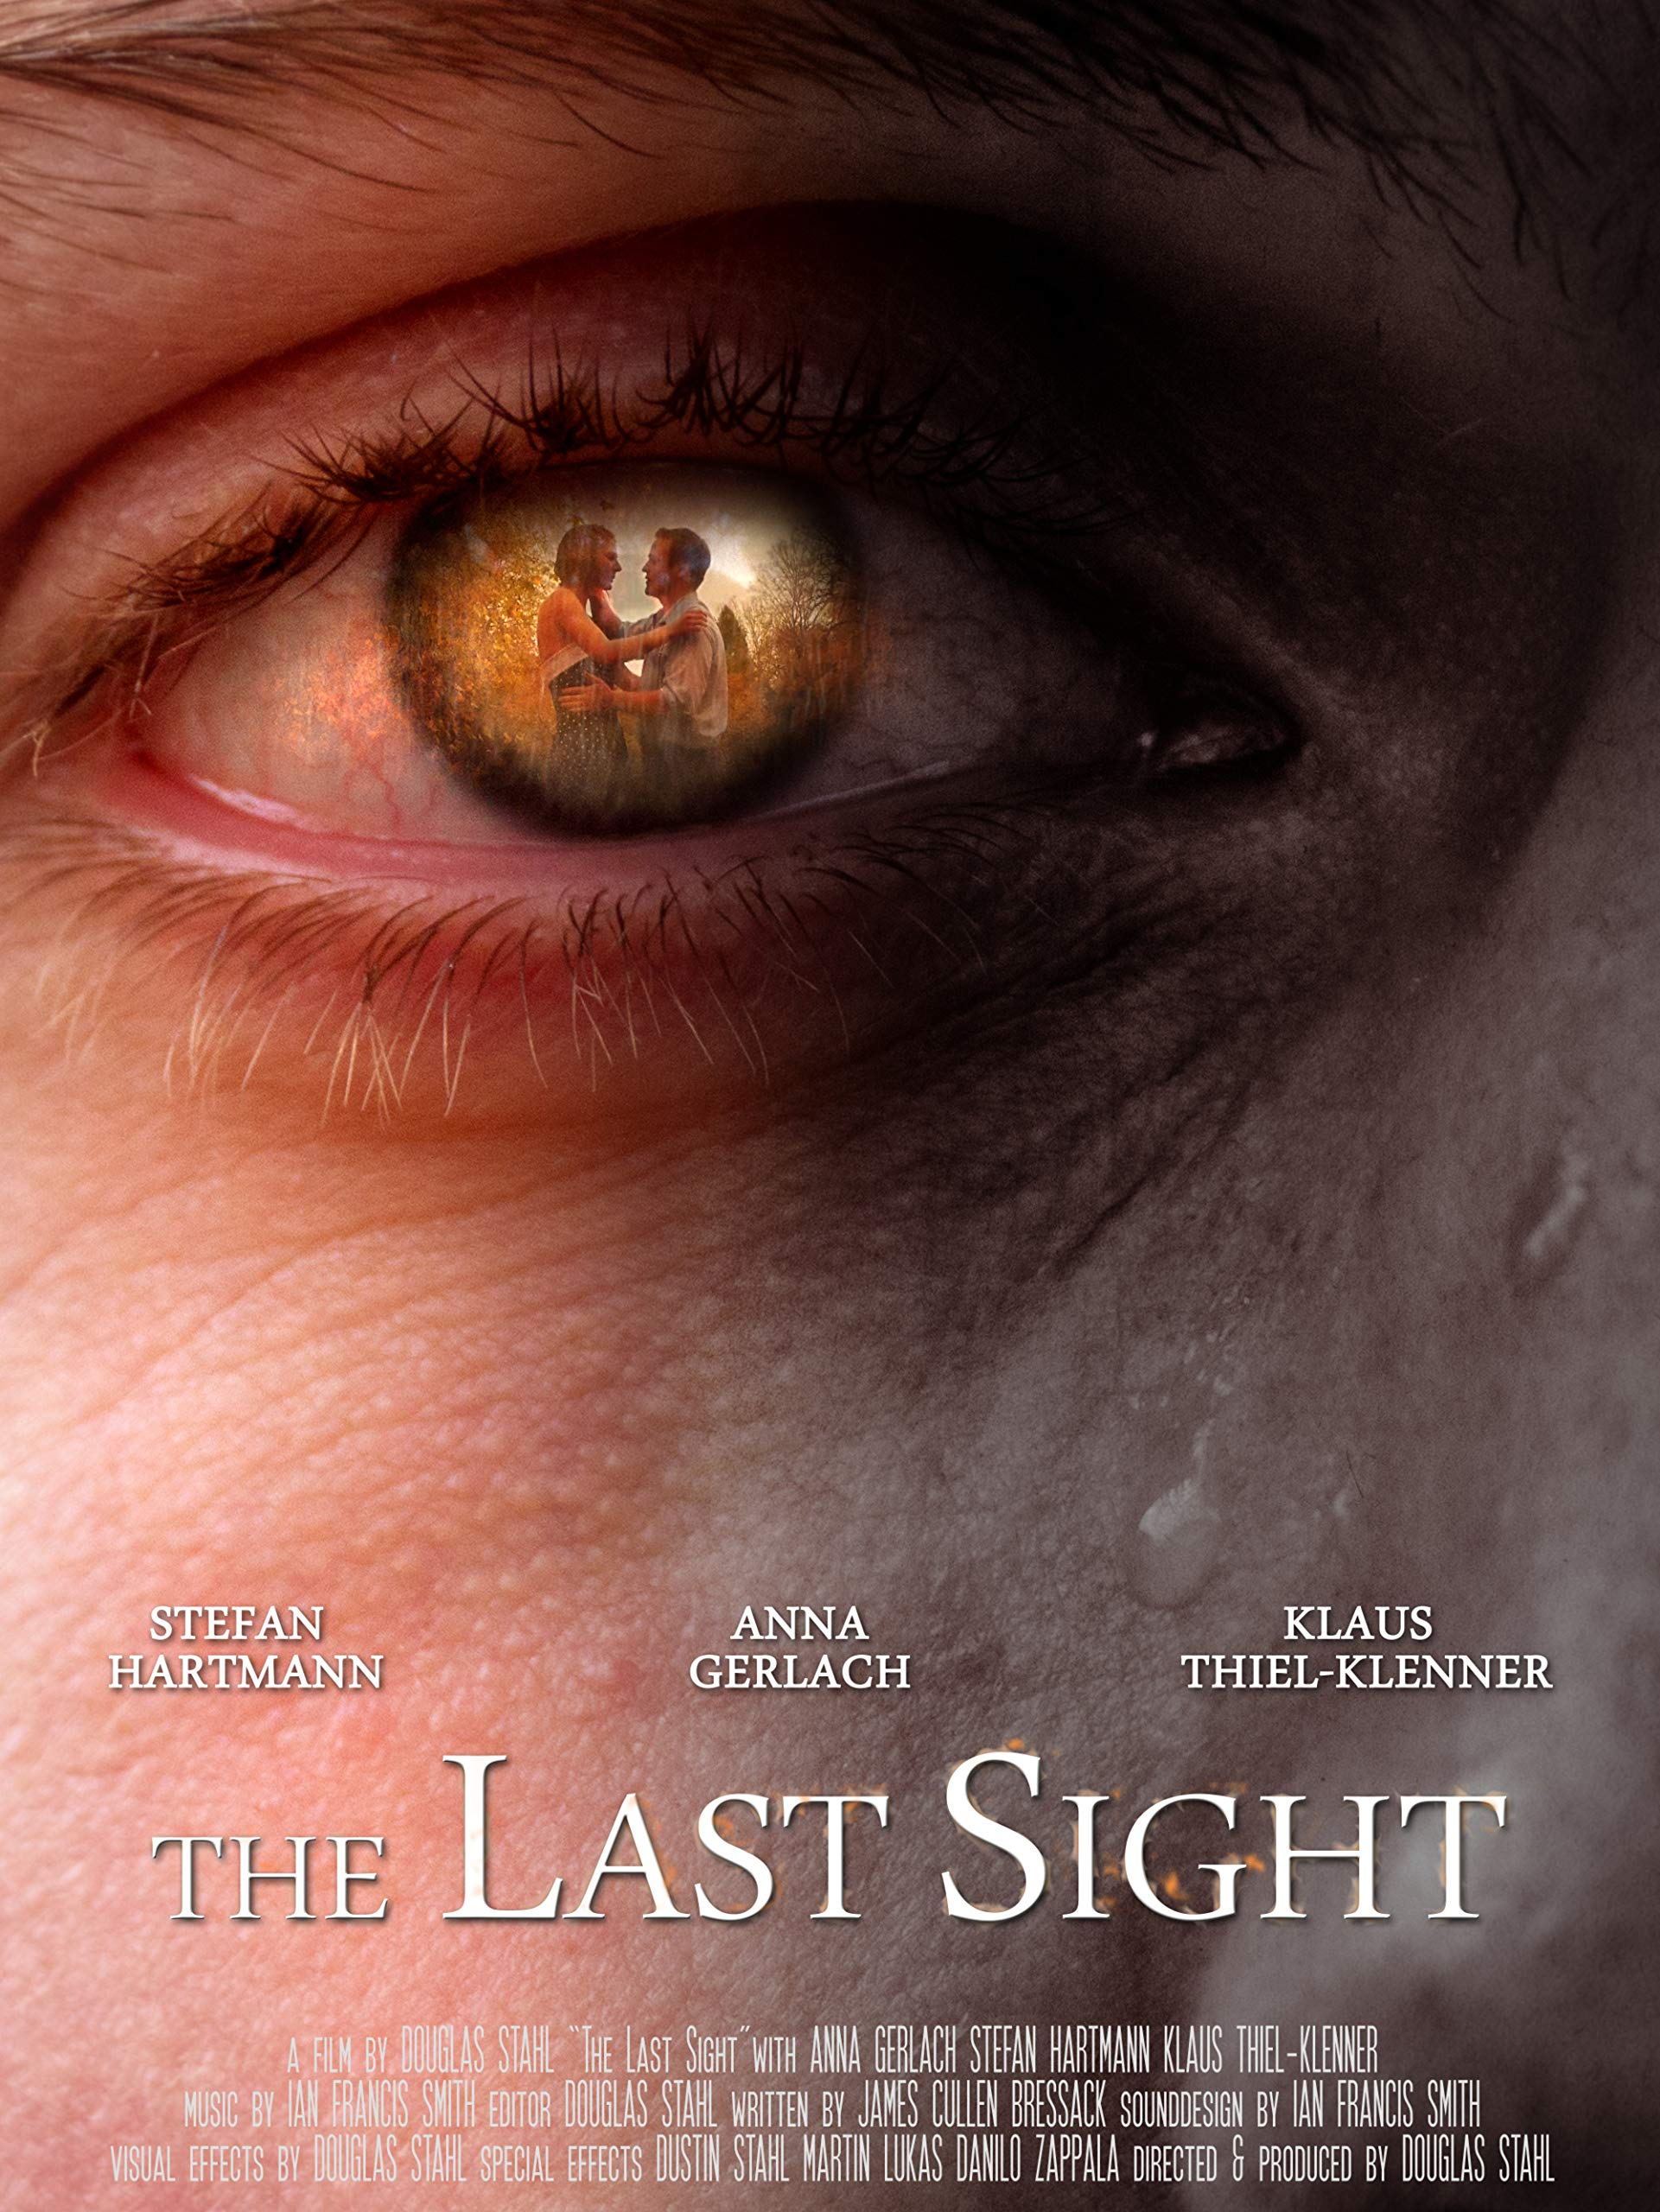 The Last Sight